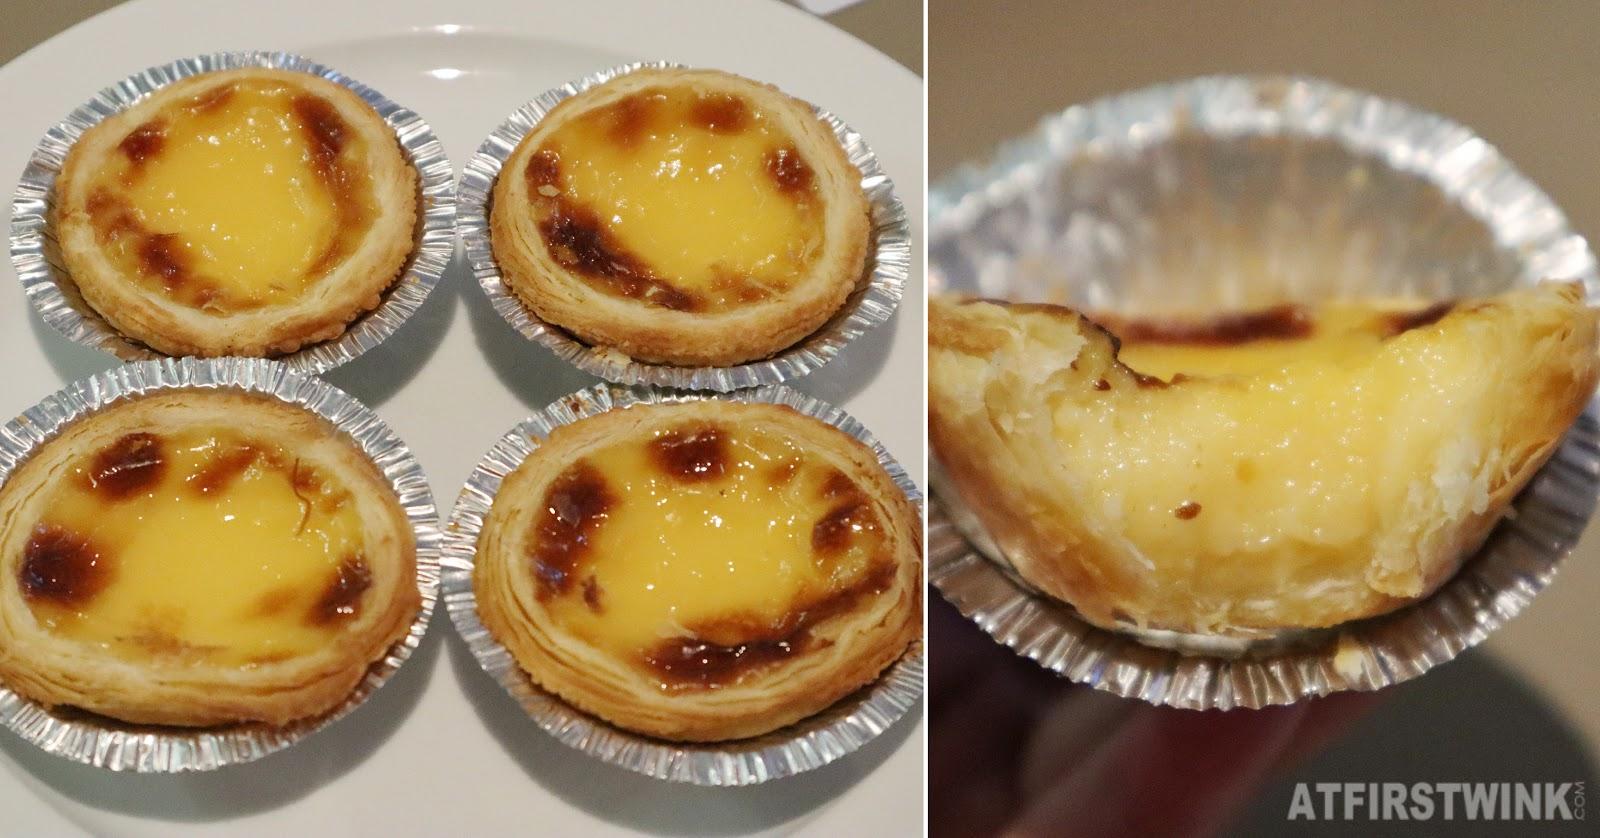 Barcelona pasteis de nata egg tarts breakfast mercadona supermarket